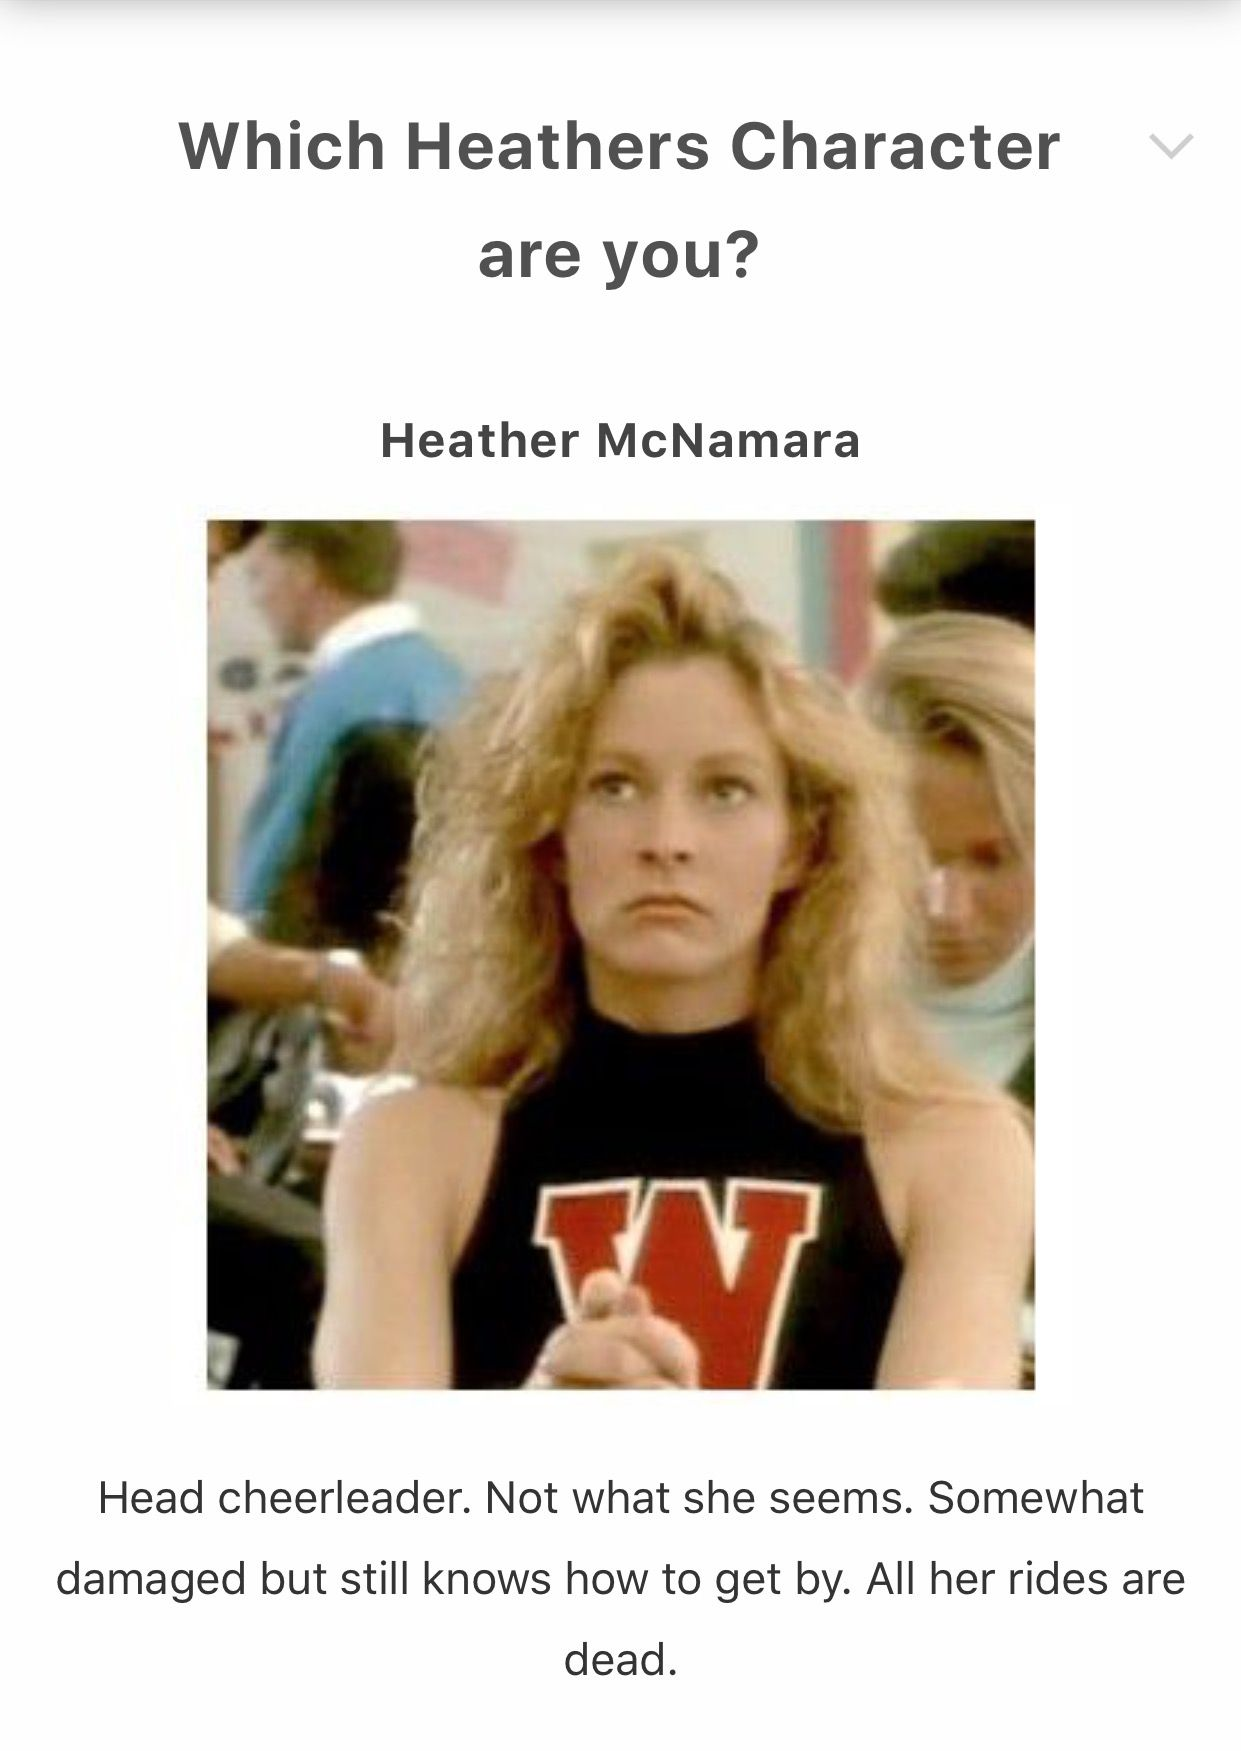 I Got Heather Mcnamara Which Heathers Character Are You